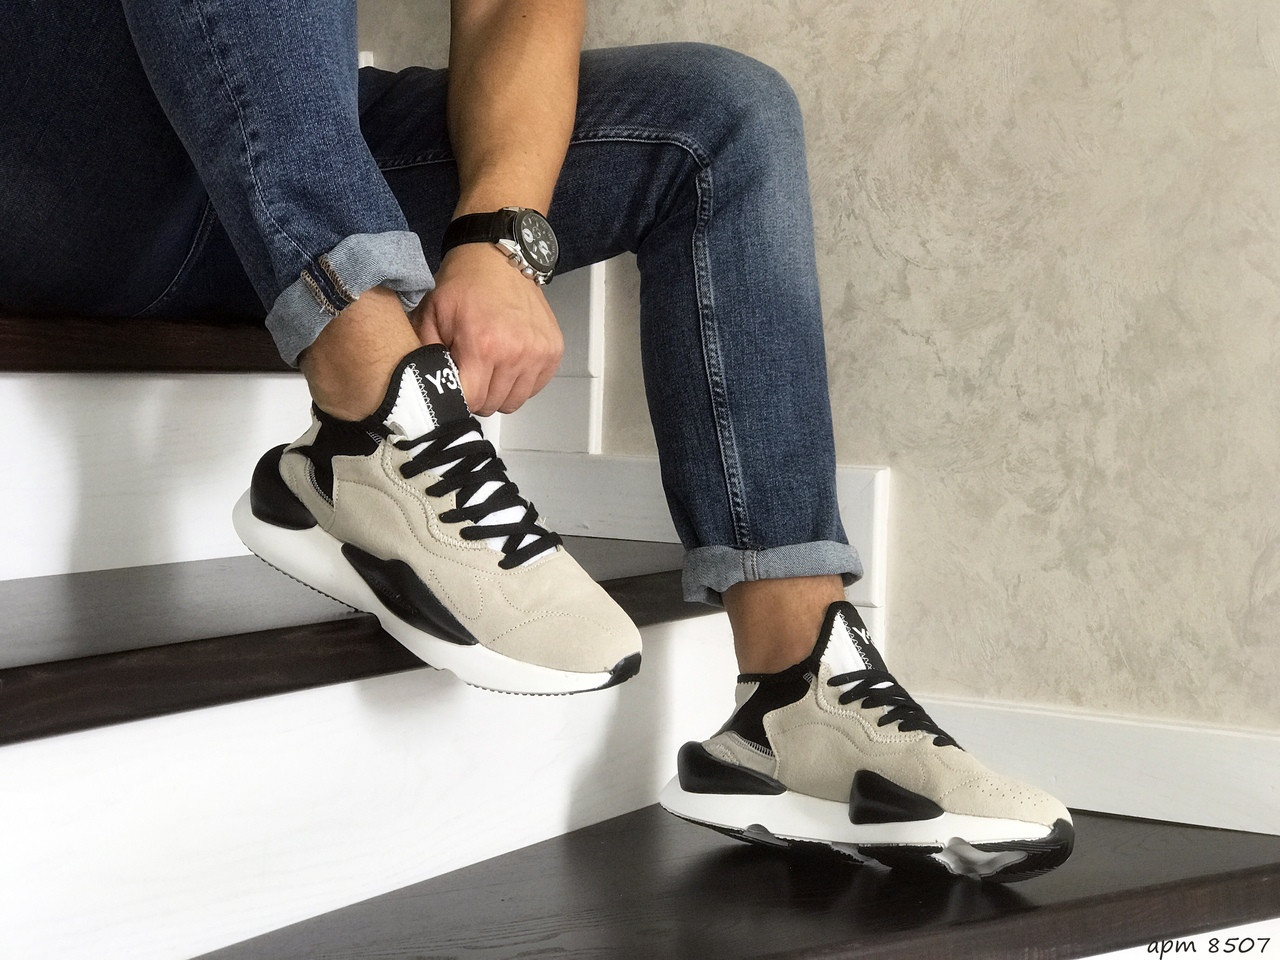 Мужские кроссовки Adidas Y-3 Kaiwa (бежевые)